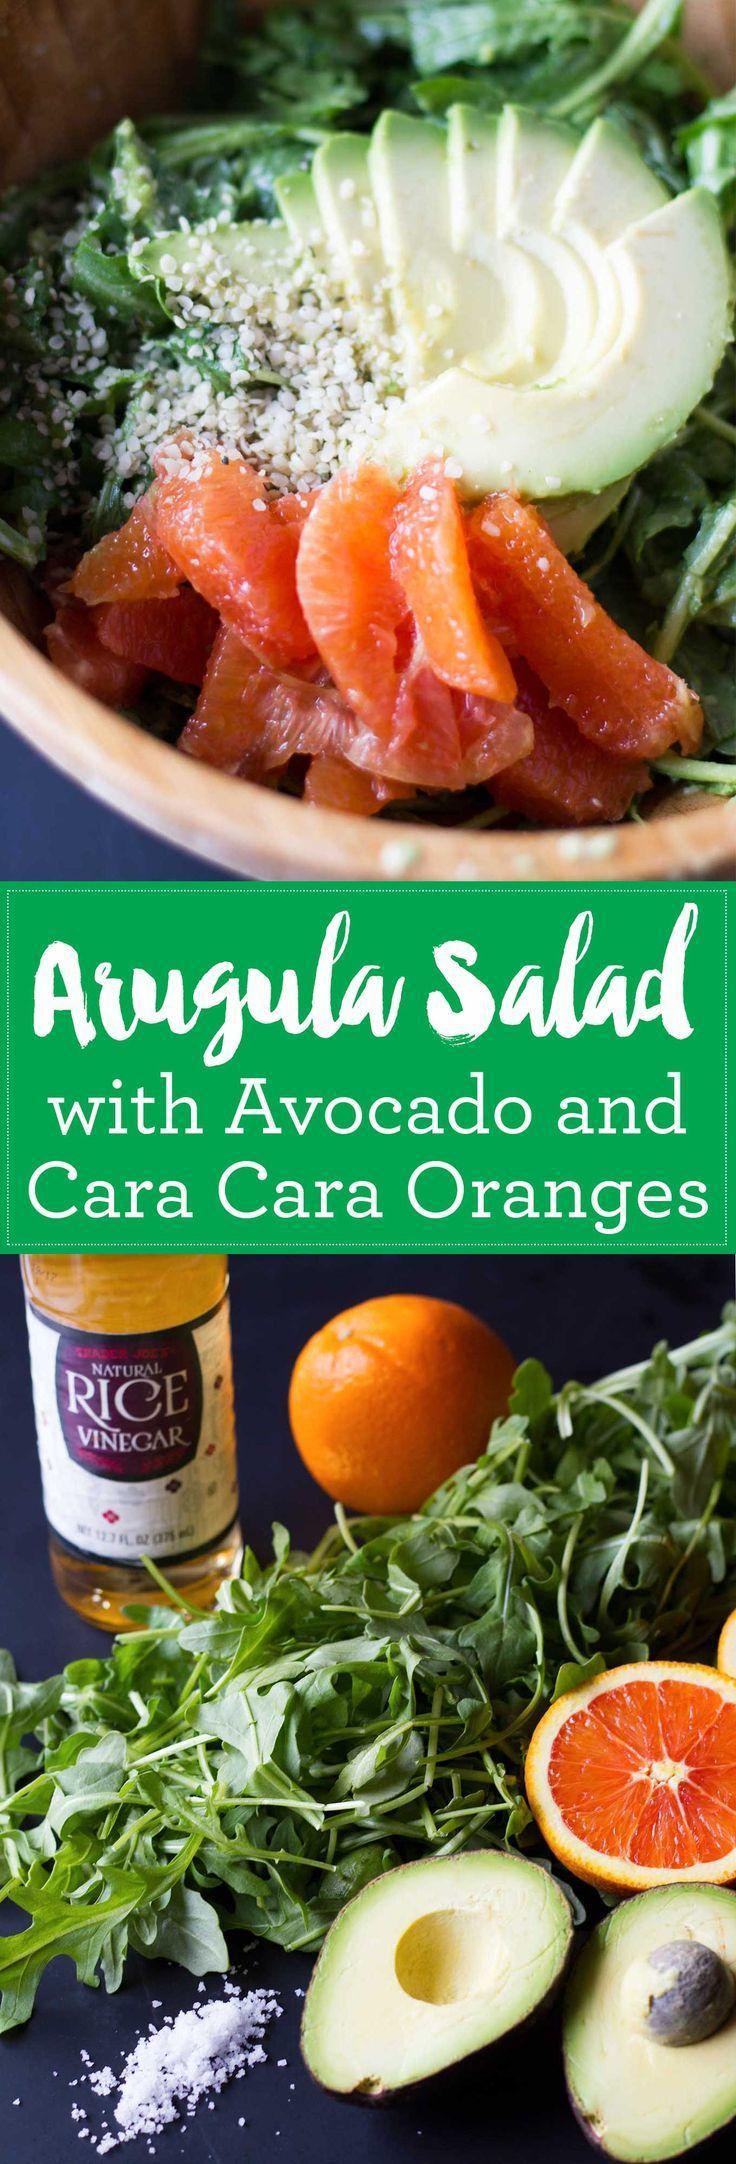 Arugula Salad with Avocado and Cara Cara Oranges - Vegan, Oil-Free, Gluten-Free  http://eatwithinyourmeans.com